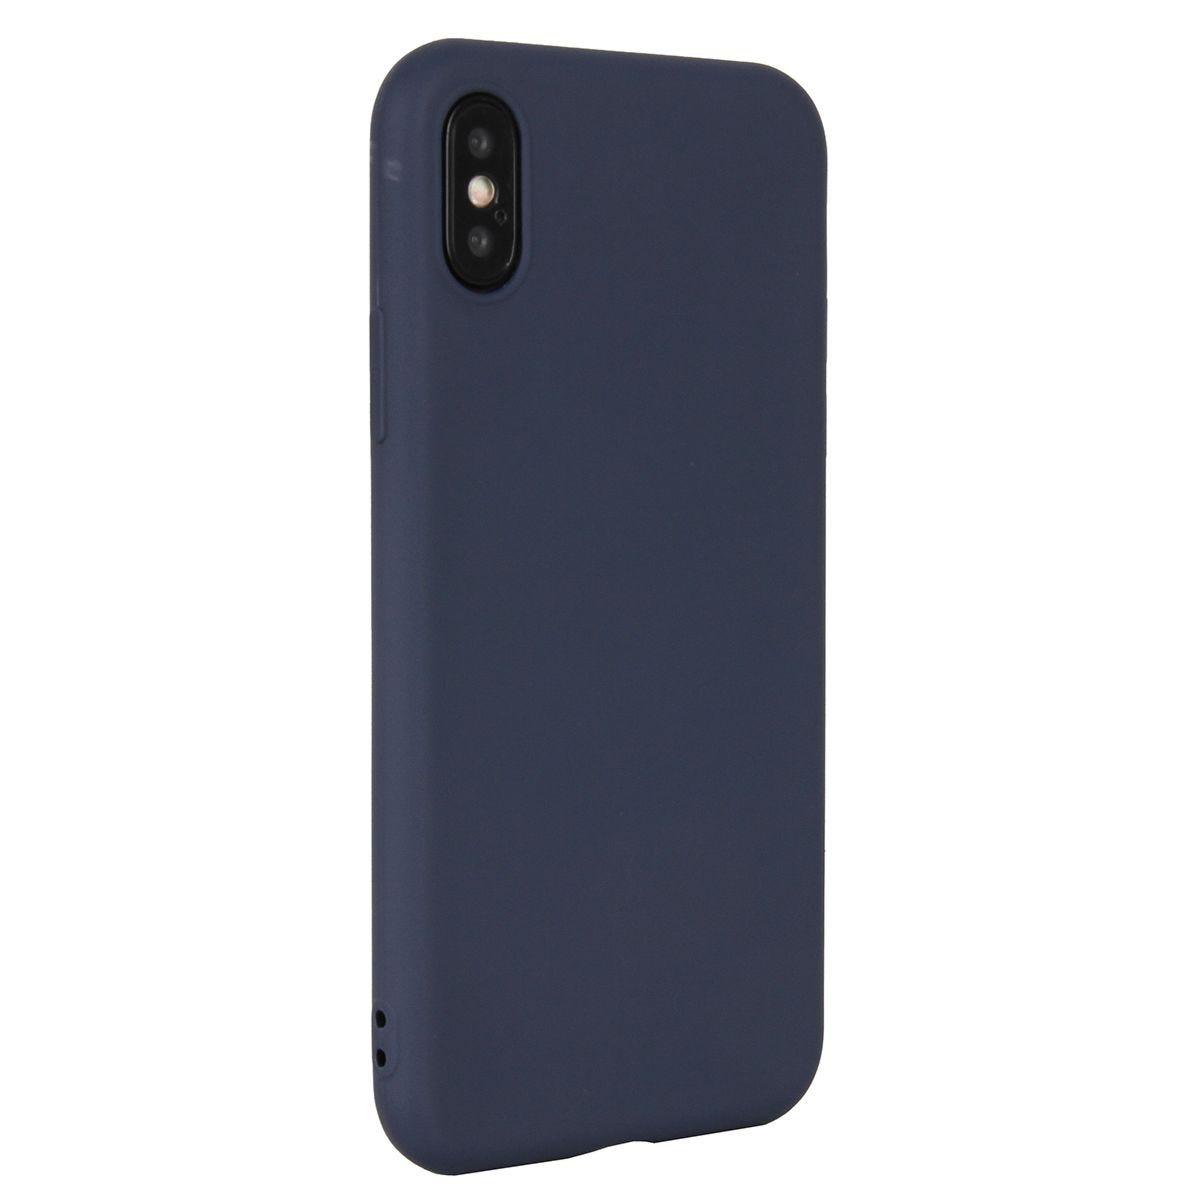 Case Flexi Cobalt Blue for iPhone X